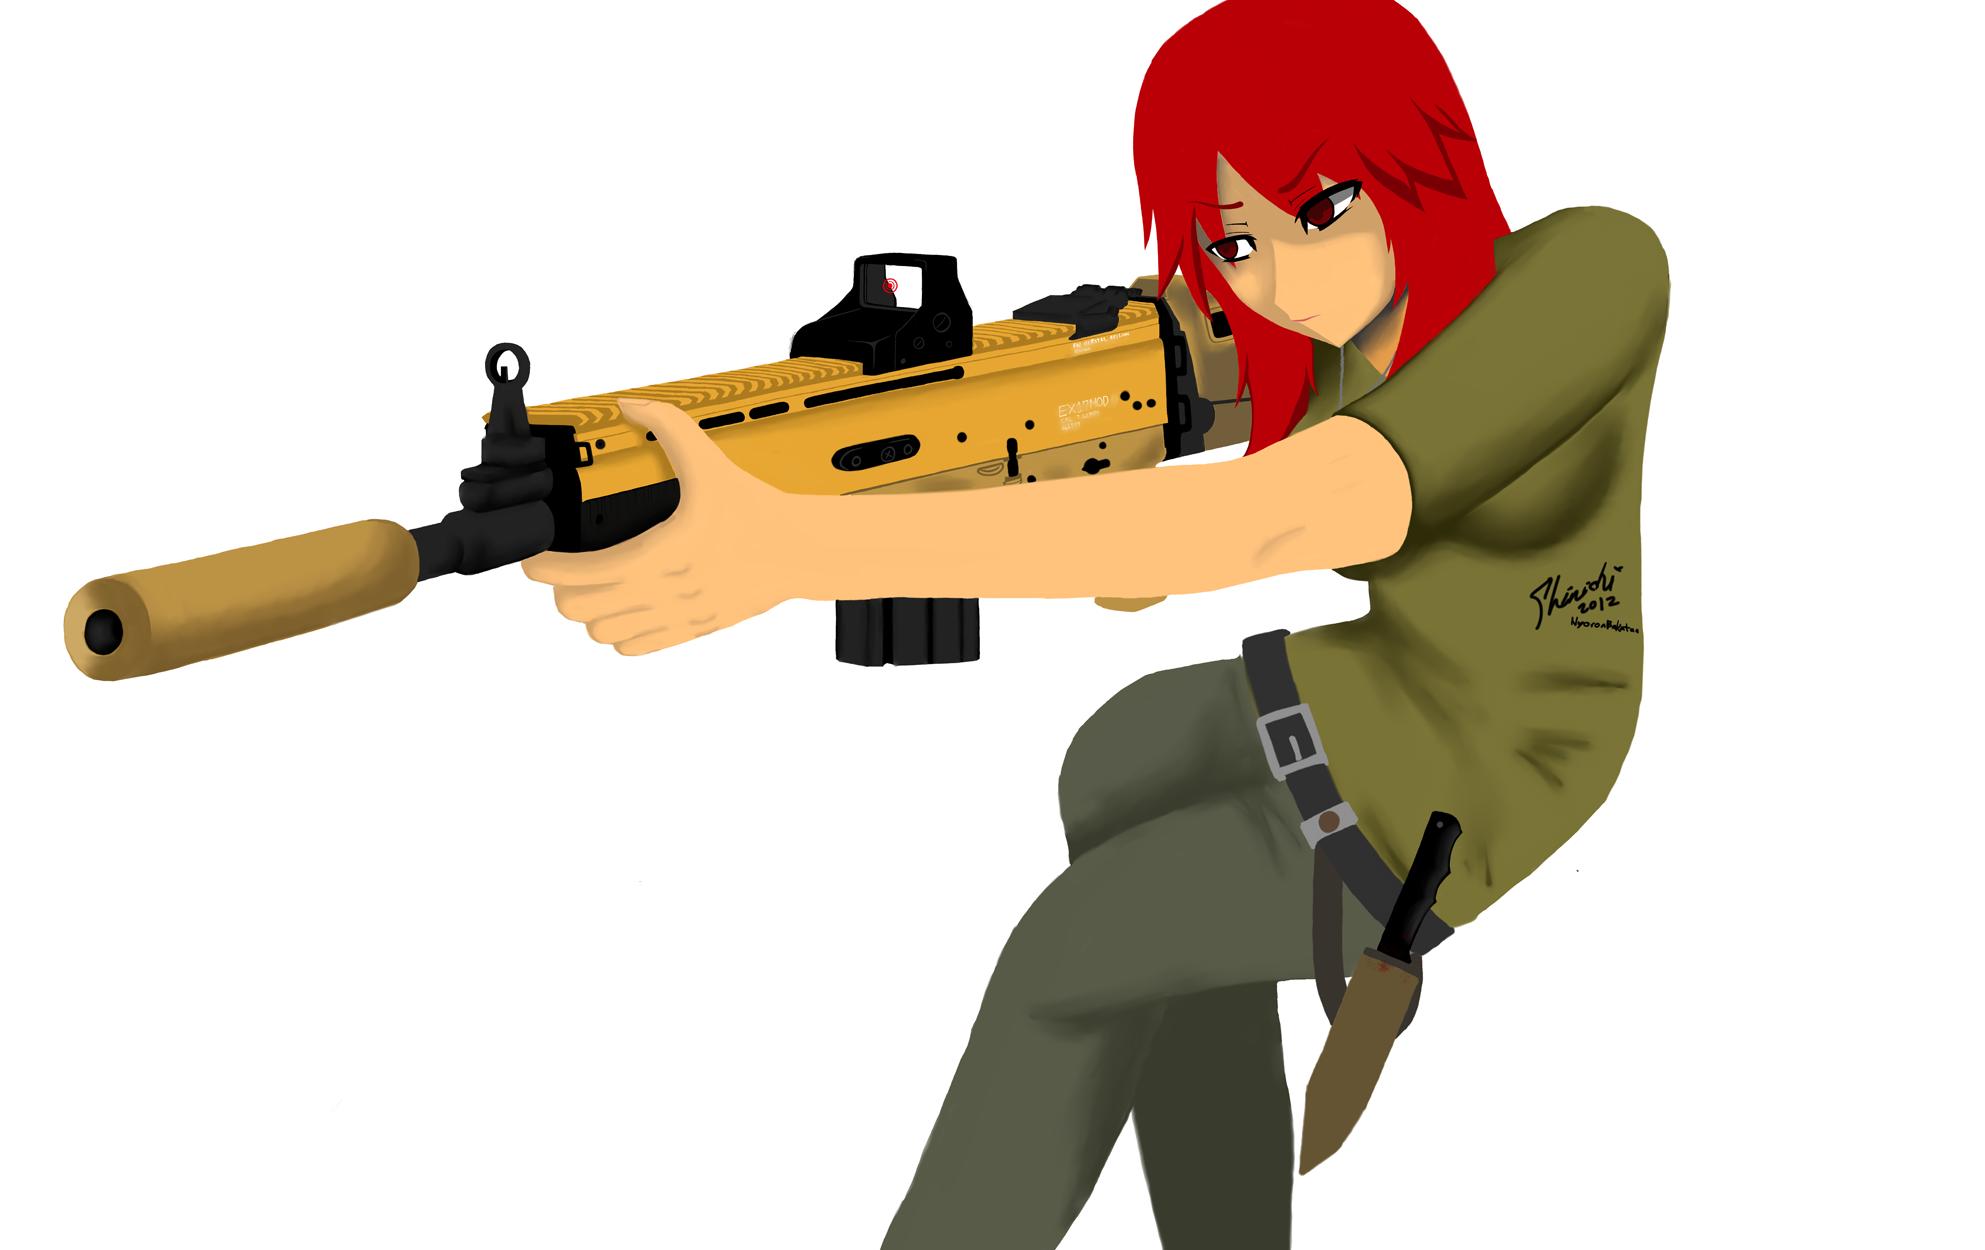 Ruby the Mercenary